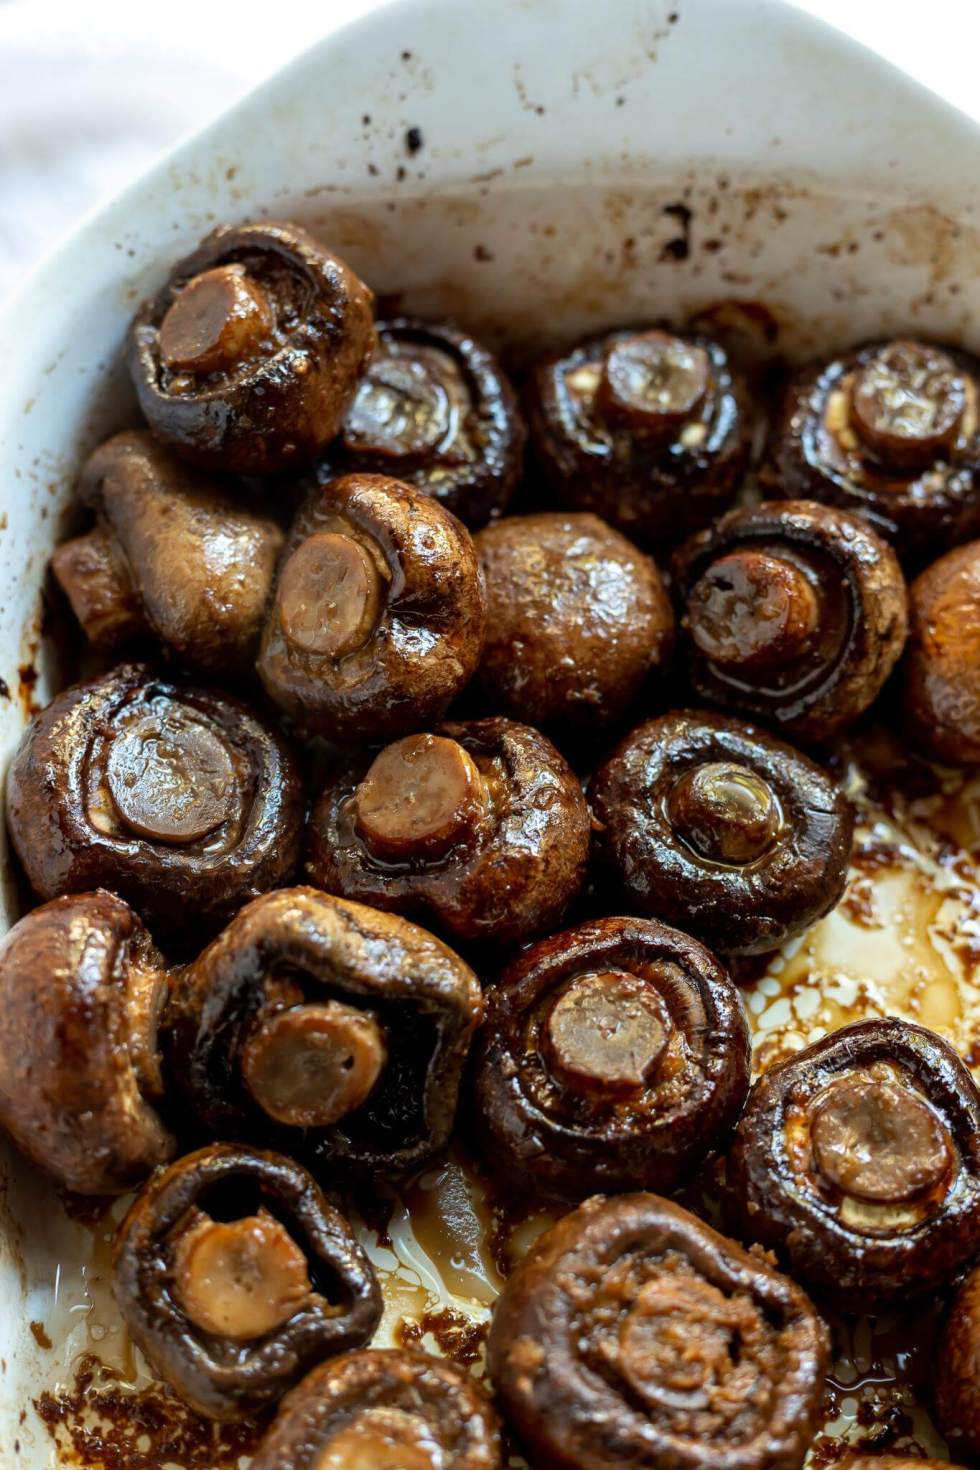 roasted mushrooms in white roasting dish